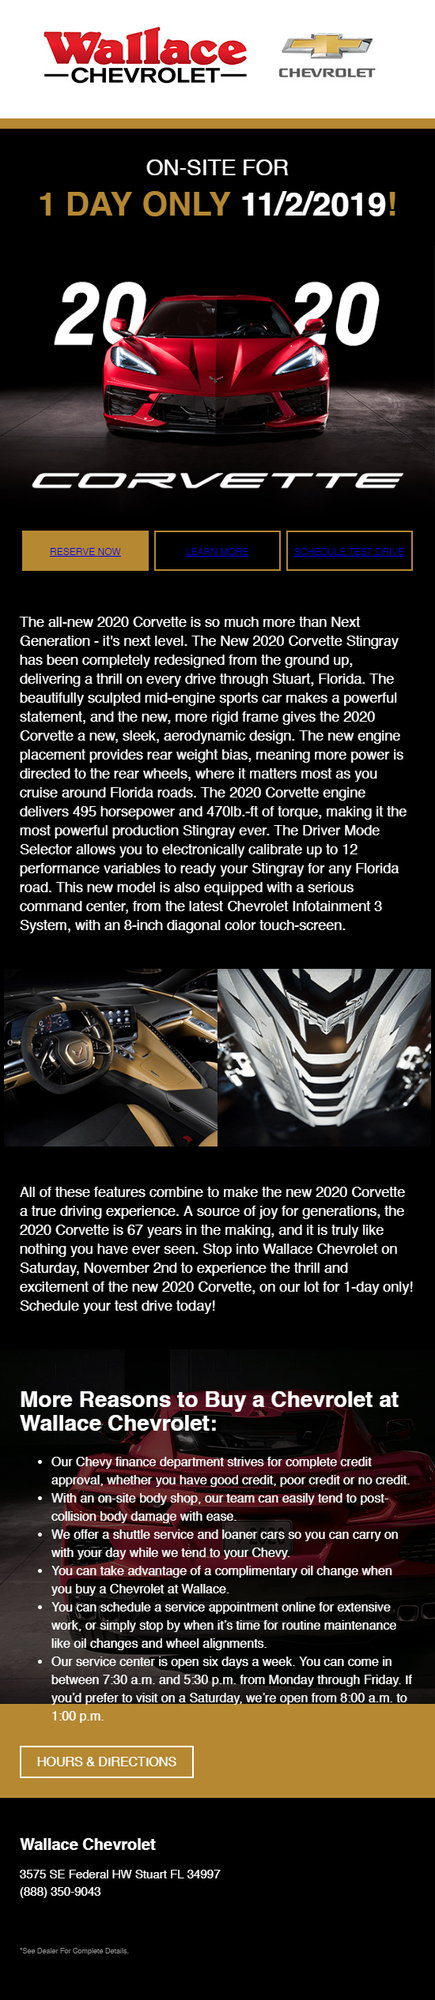 Wallace Chevrolet Stuart Fl >> Wallace Chevrolet In Florida To Have 2020 Corvette